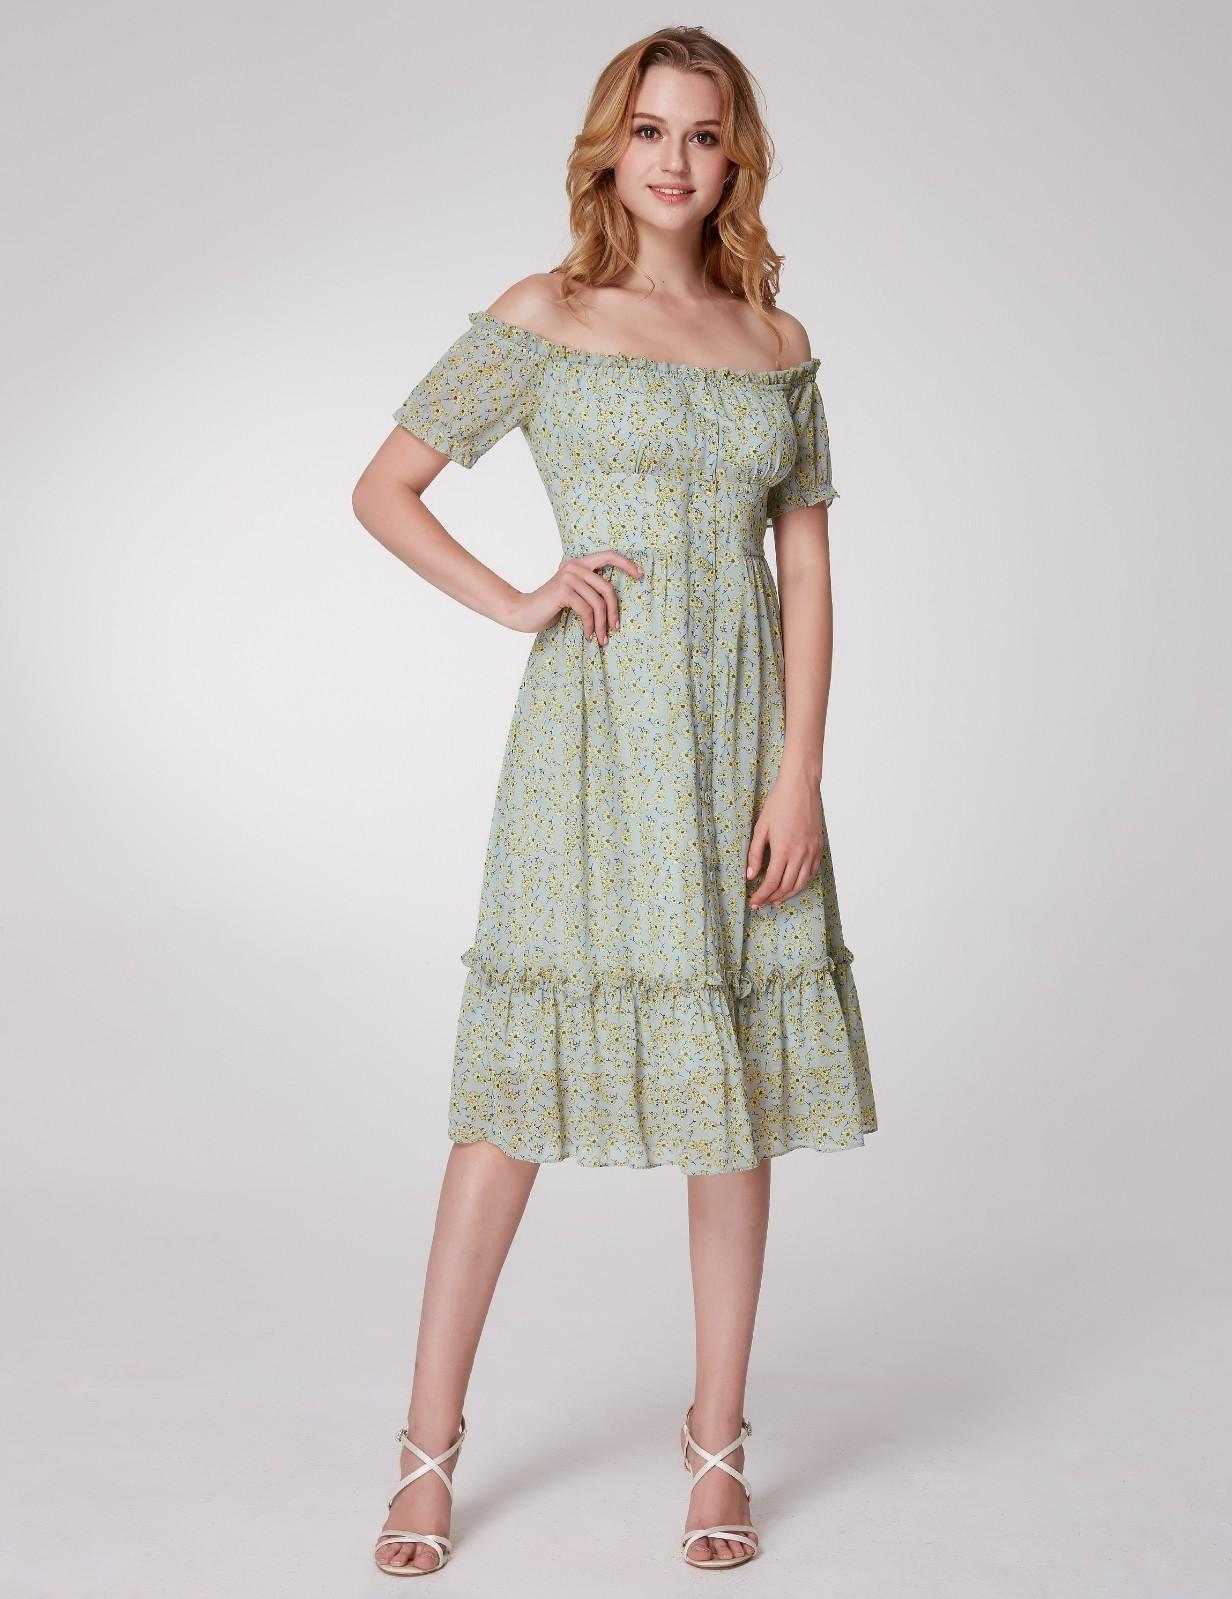 bc29ddd2b3c6 Details about Alisa Pan US Short Off Shoulder Casual Dresses Floral Printed Summer  Dress 05958